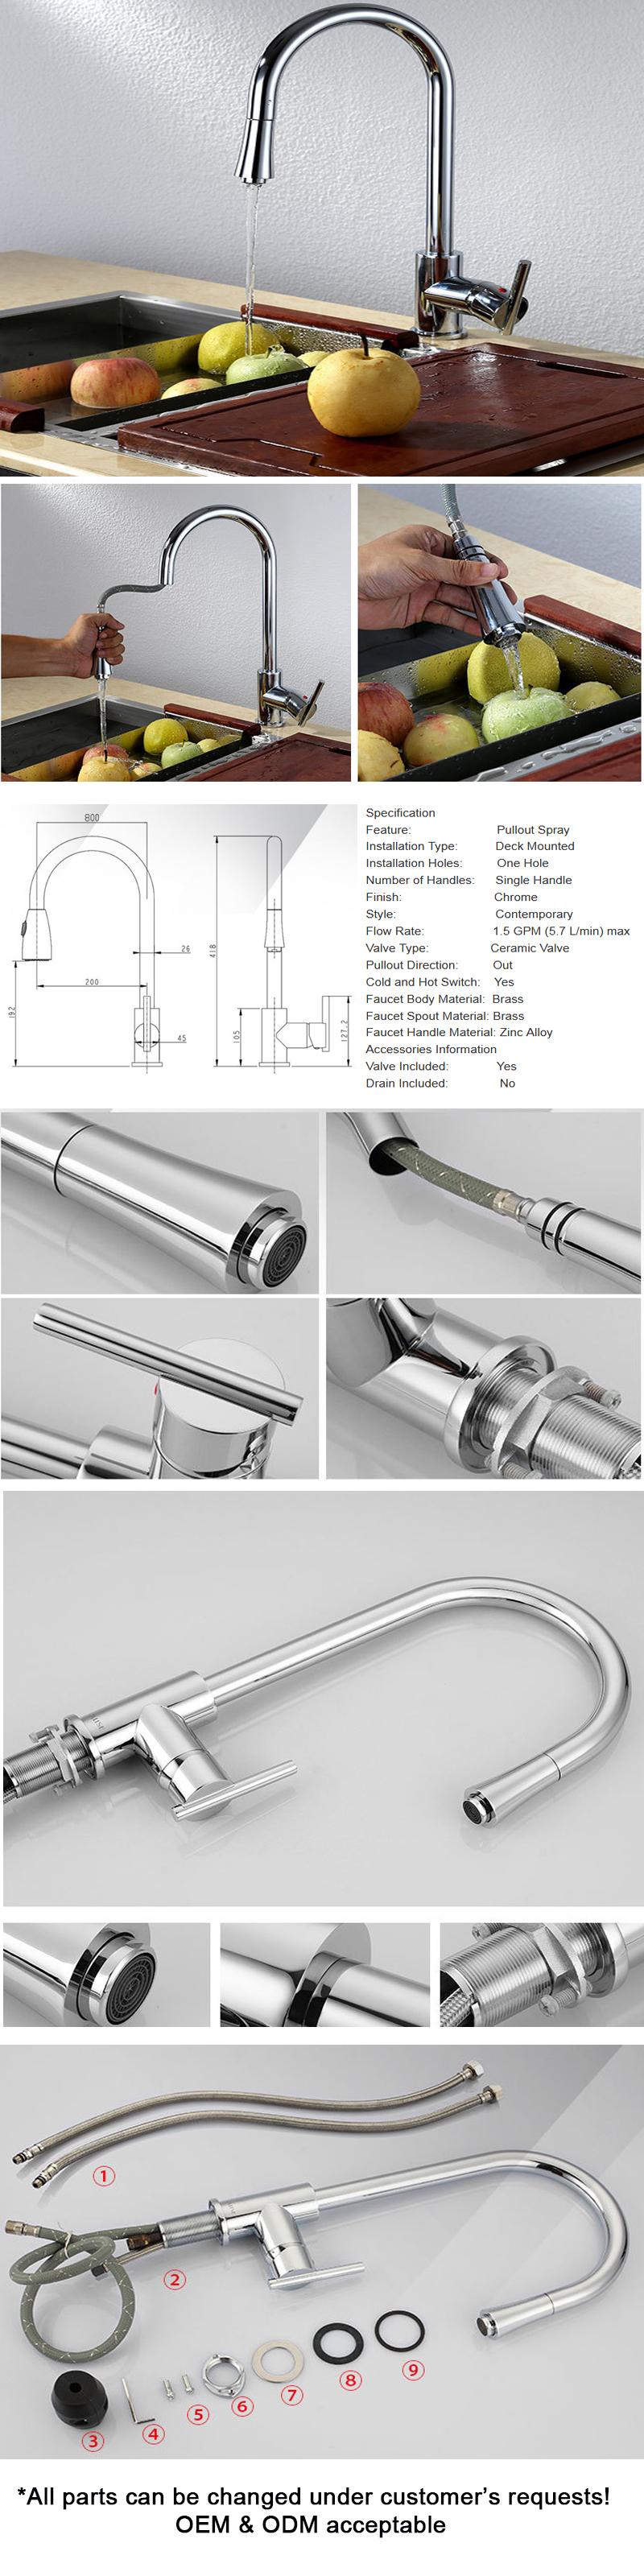 Sanitary Ware Flexible Faucets Kitchen Tap Water Spout Kitchen Mixer